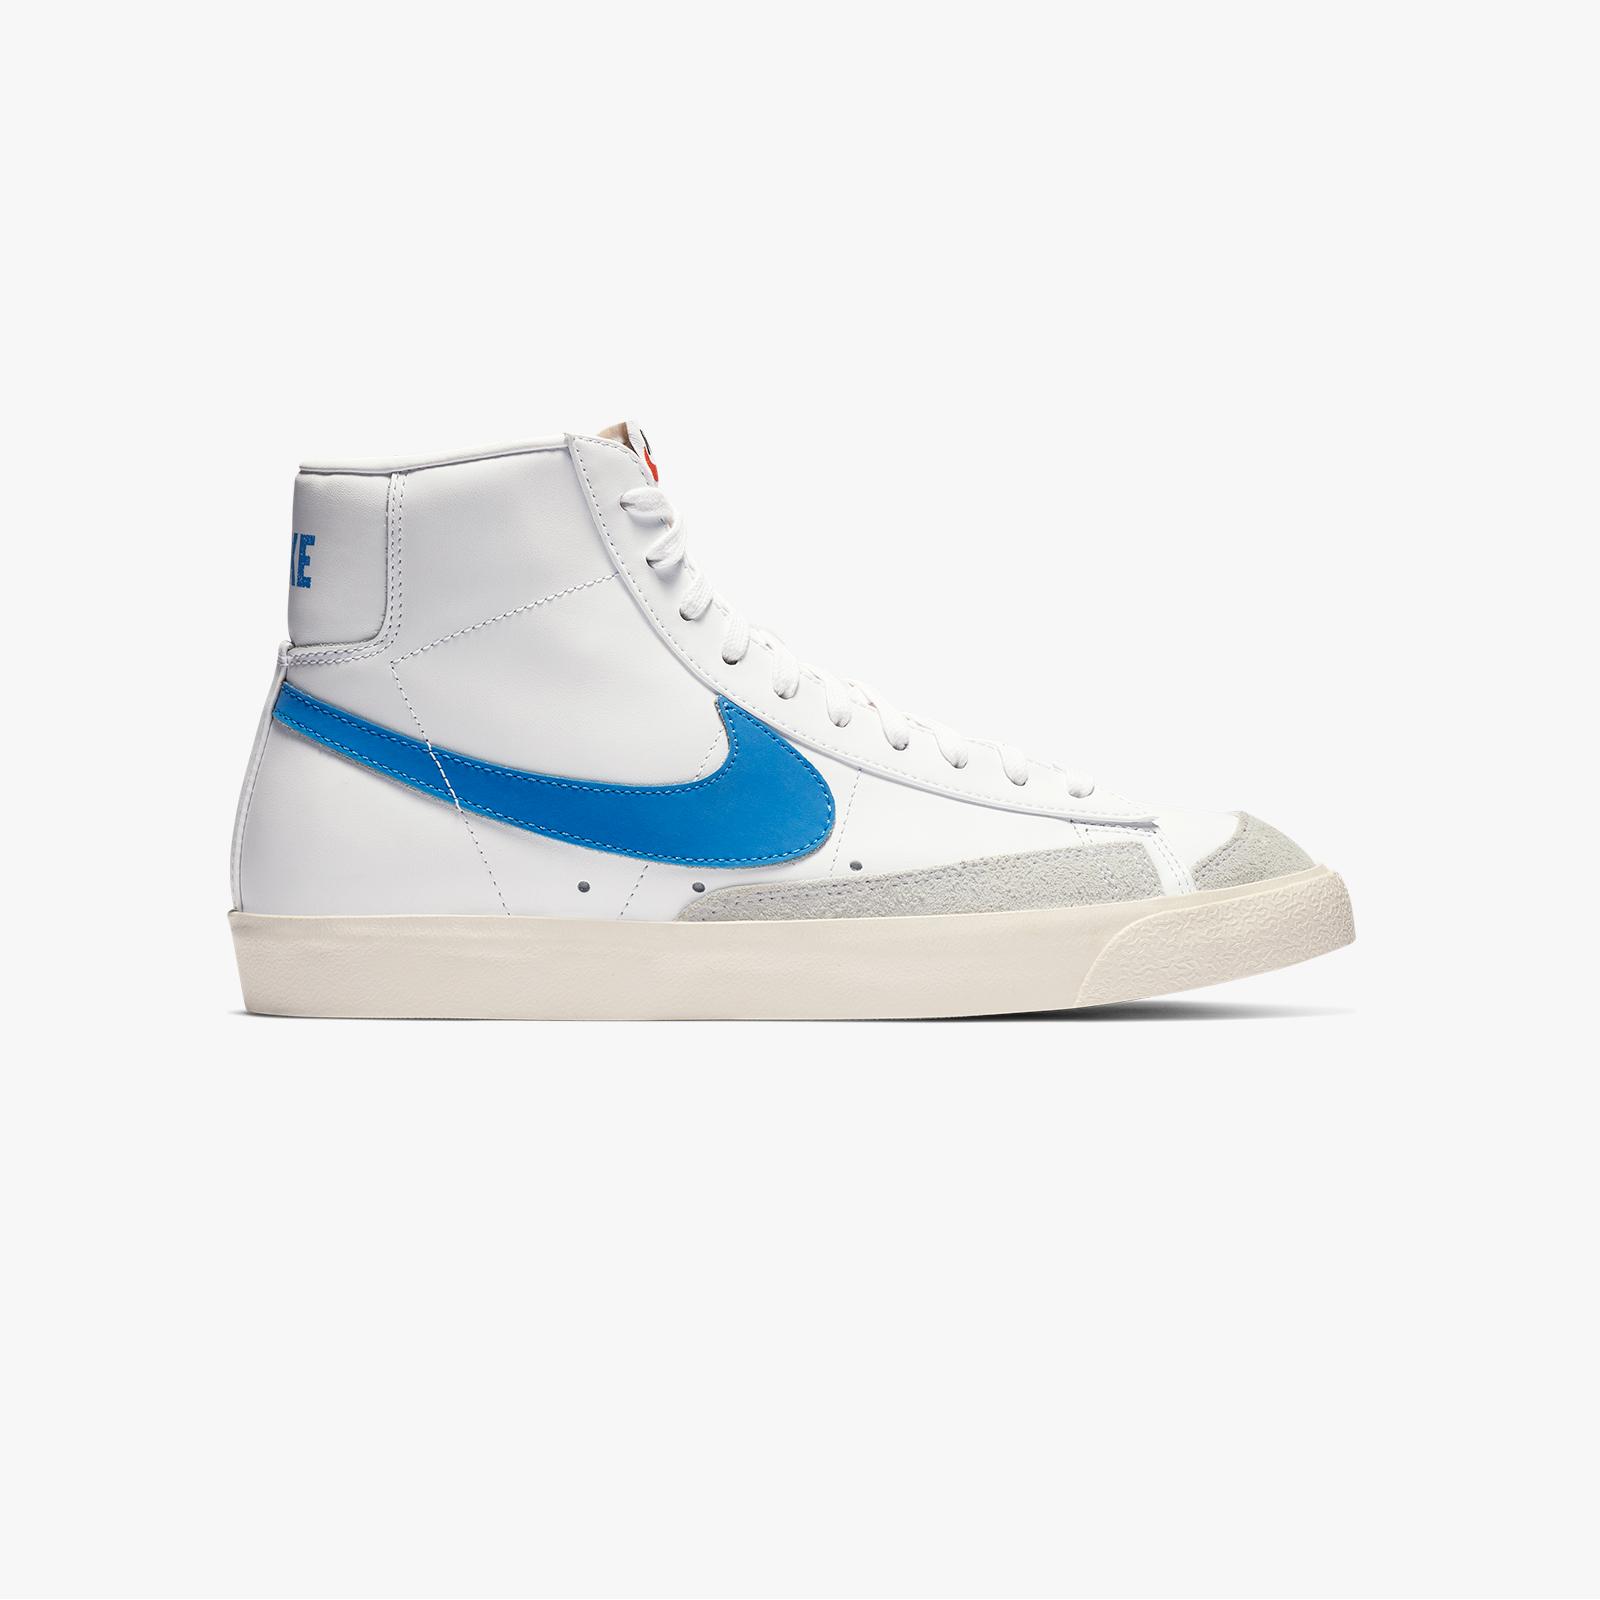 Nike Blazer Mid 77 Vintage Bq6806 400 Sneakersnstuff I